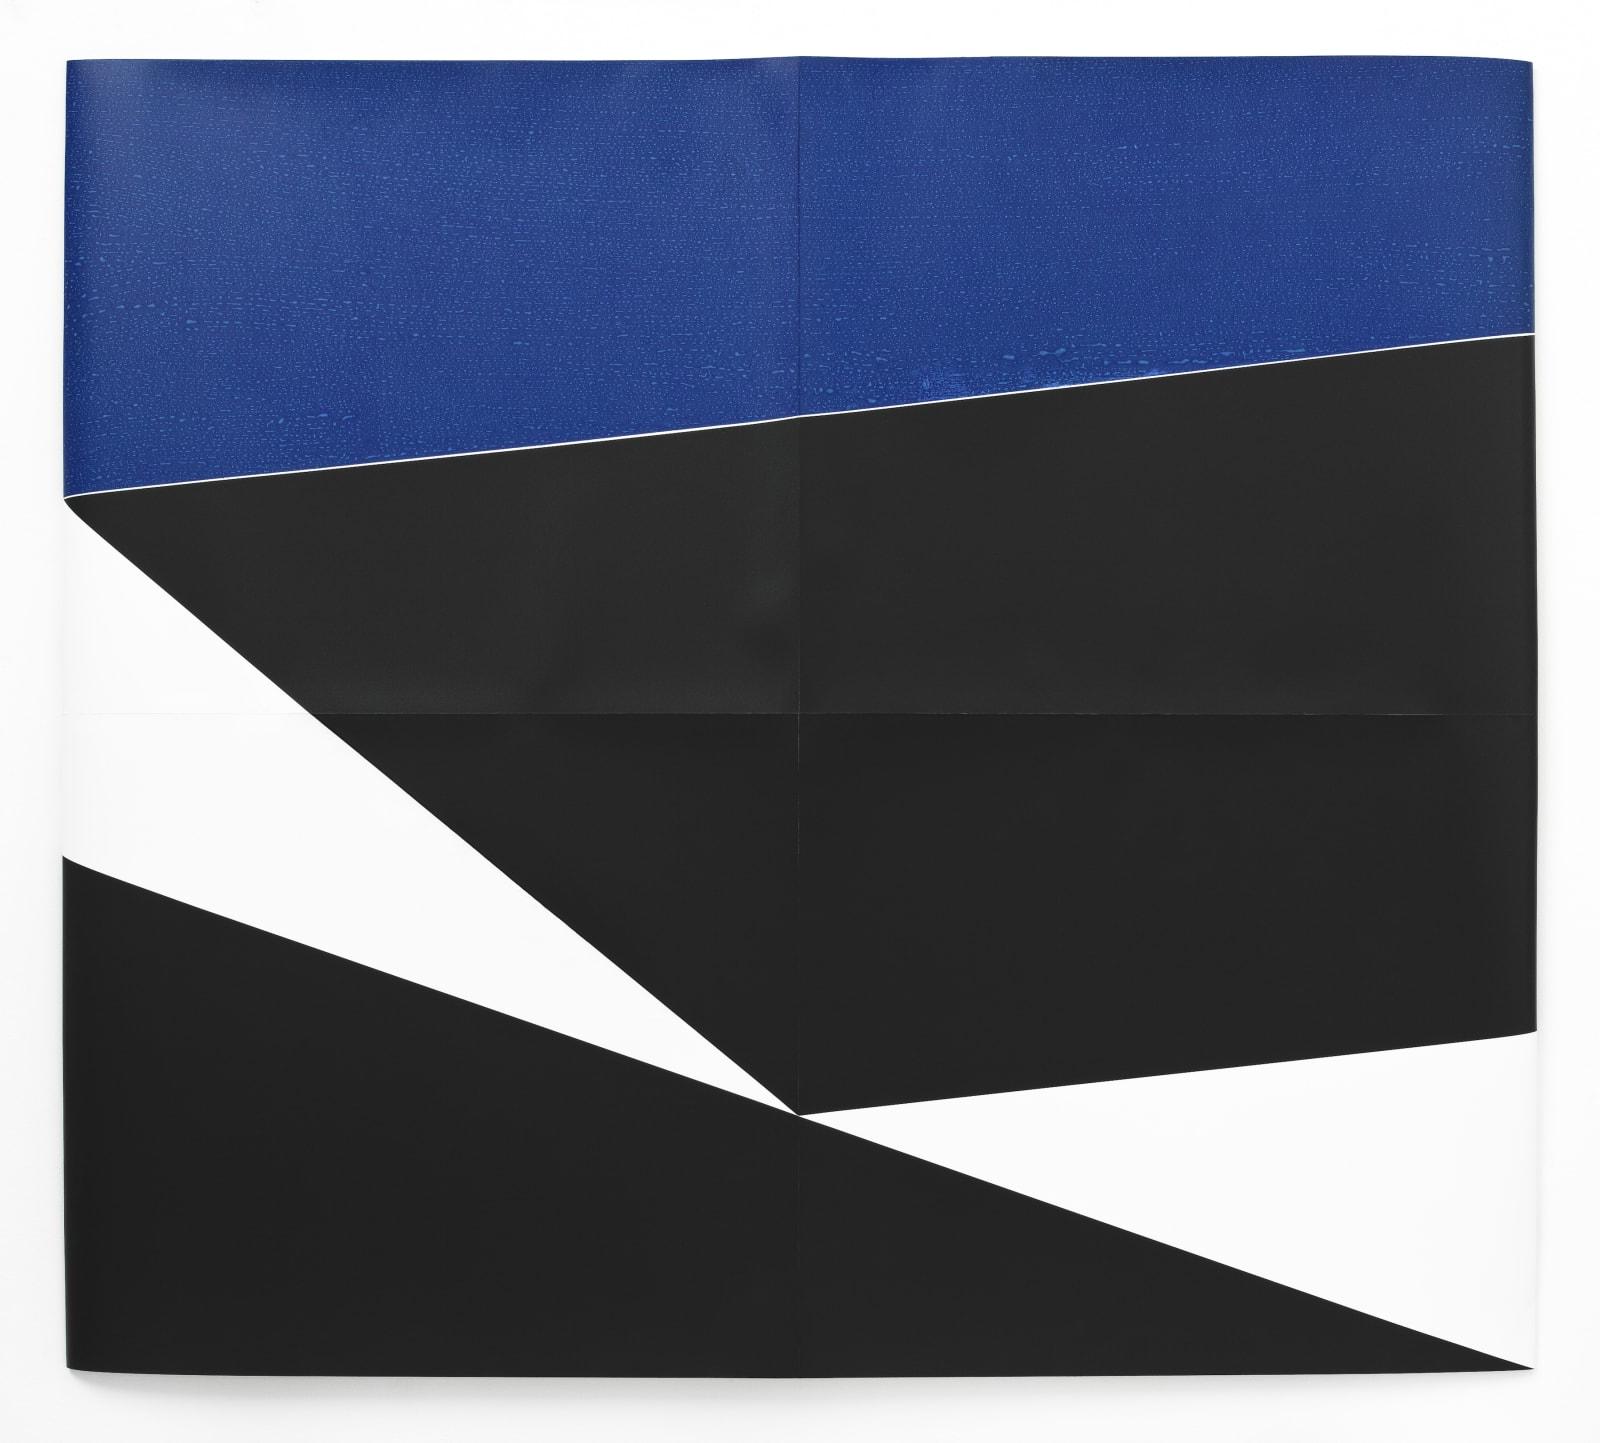 Nikolai Ishchuk, Arcadia (5), 2019 Silver gelatin prints, cyanotype and mixed media 40 1/4 x 44 7/8 x 3/4 in 102.1 x 114 x 2 cm Unique $ 7,700.00